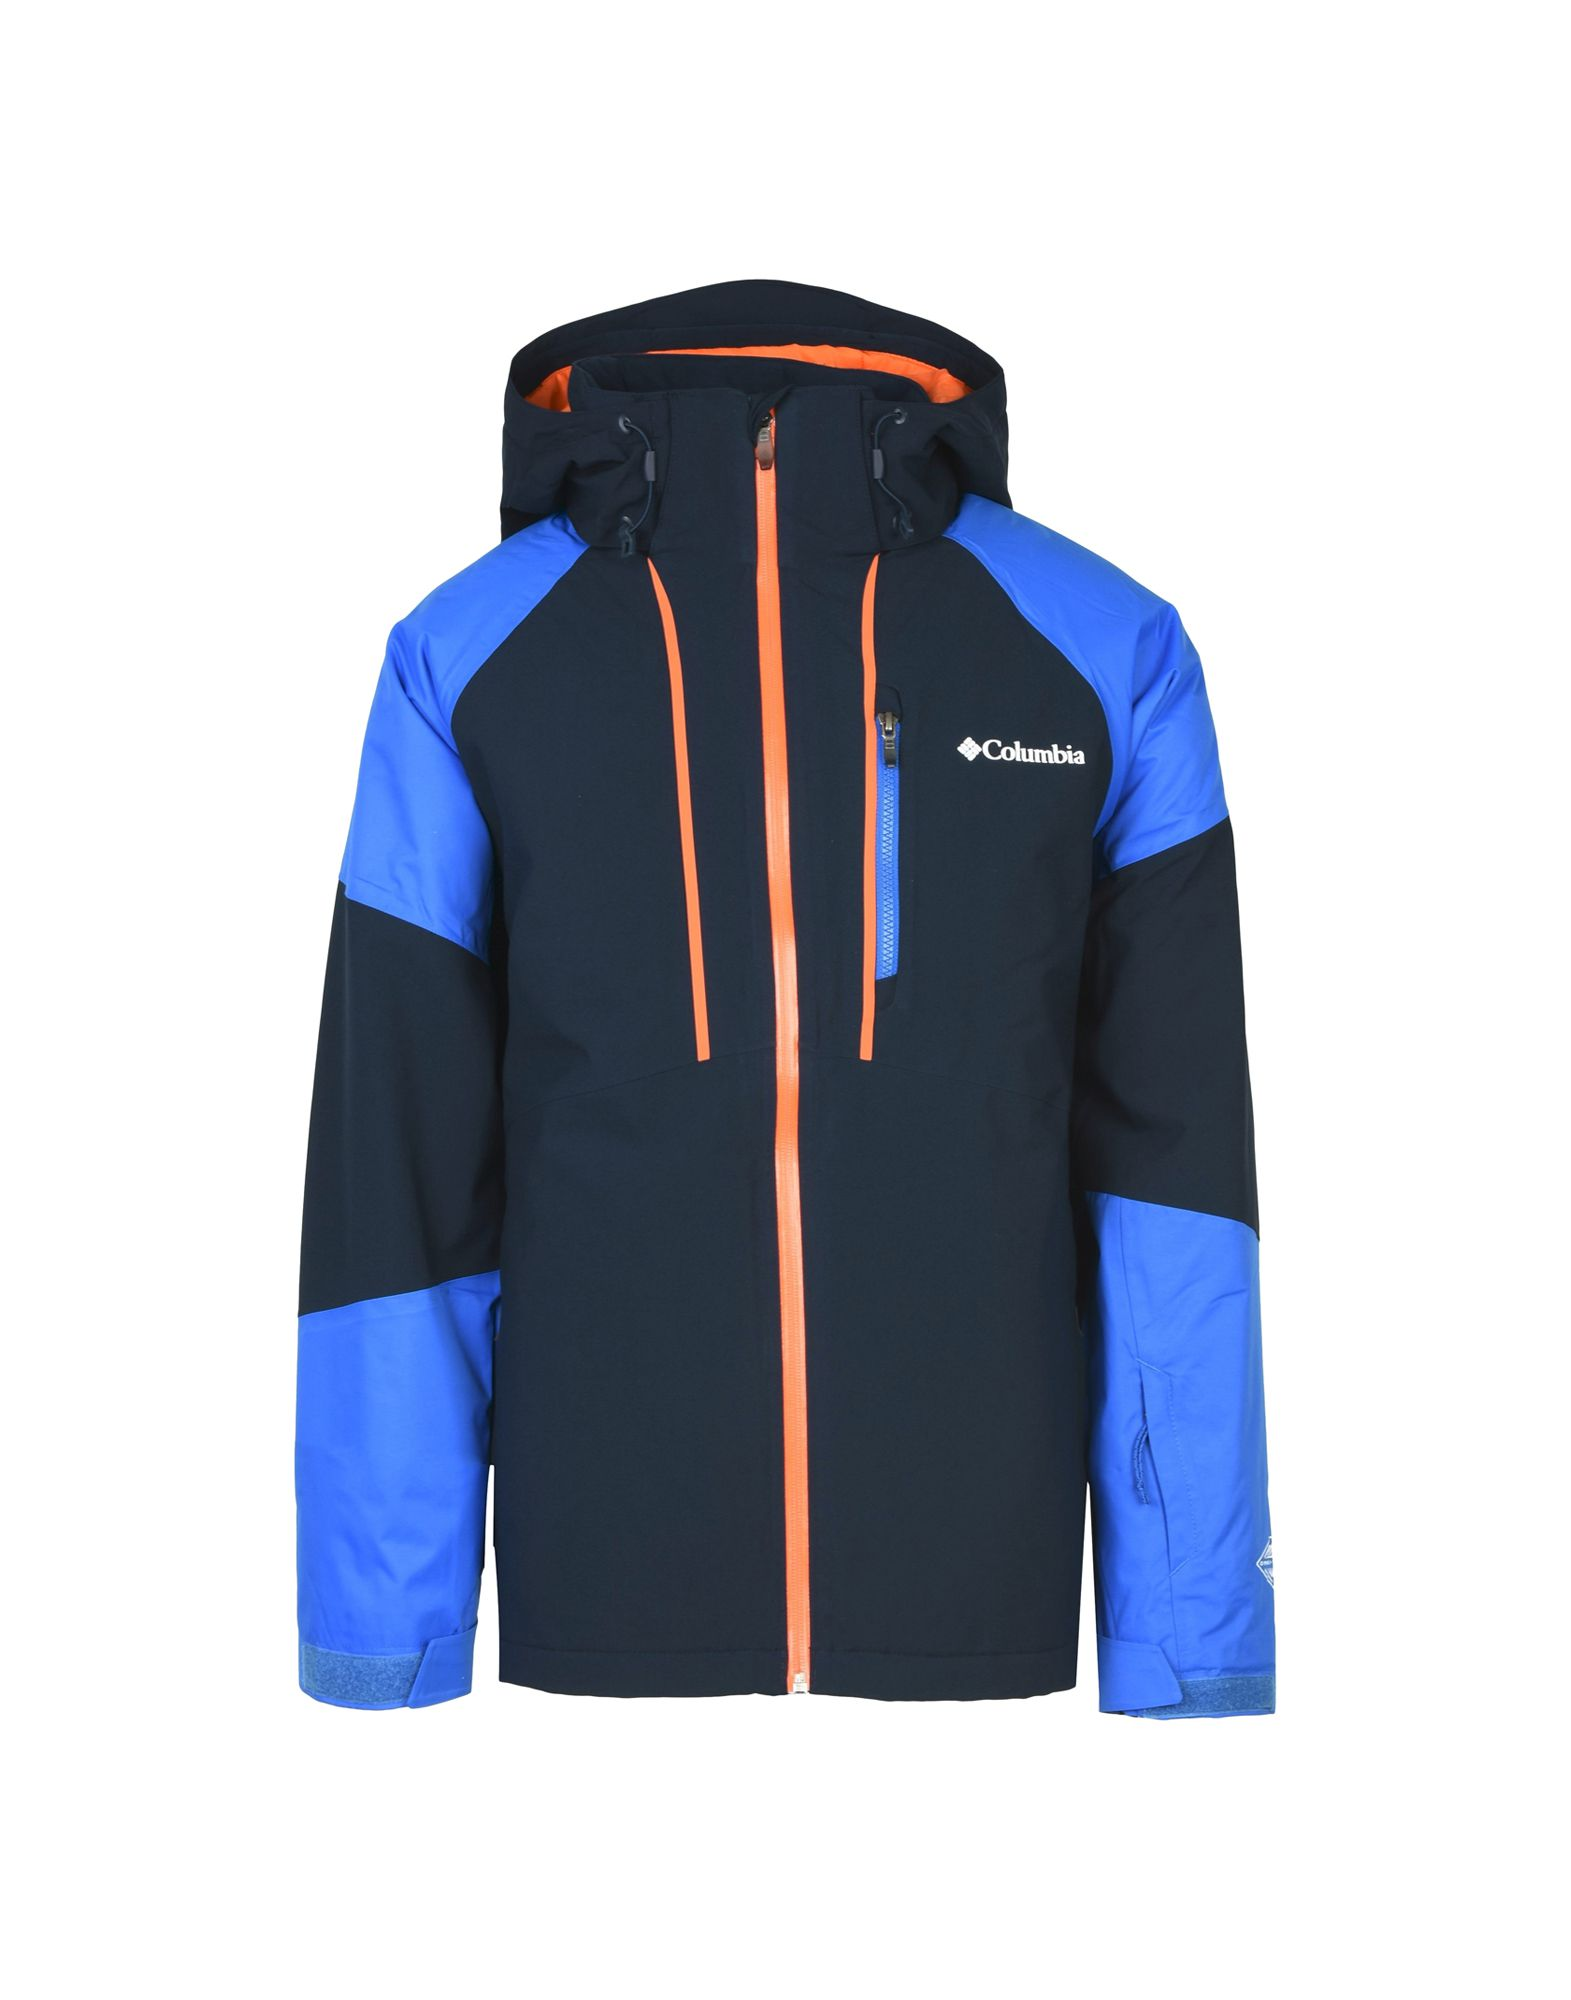 Giubbotto Columbia Gitback™ Jacket - Uomo - Acquista online su